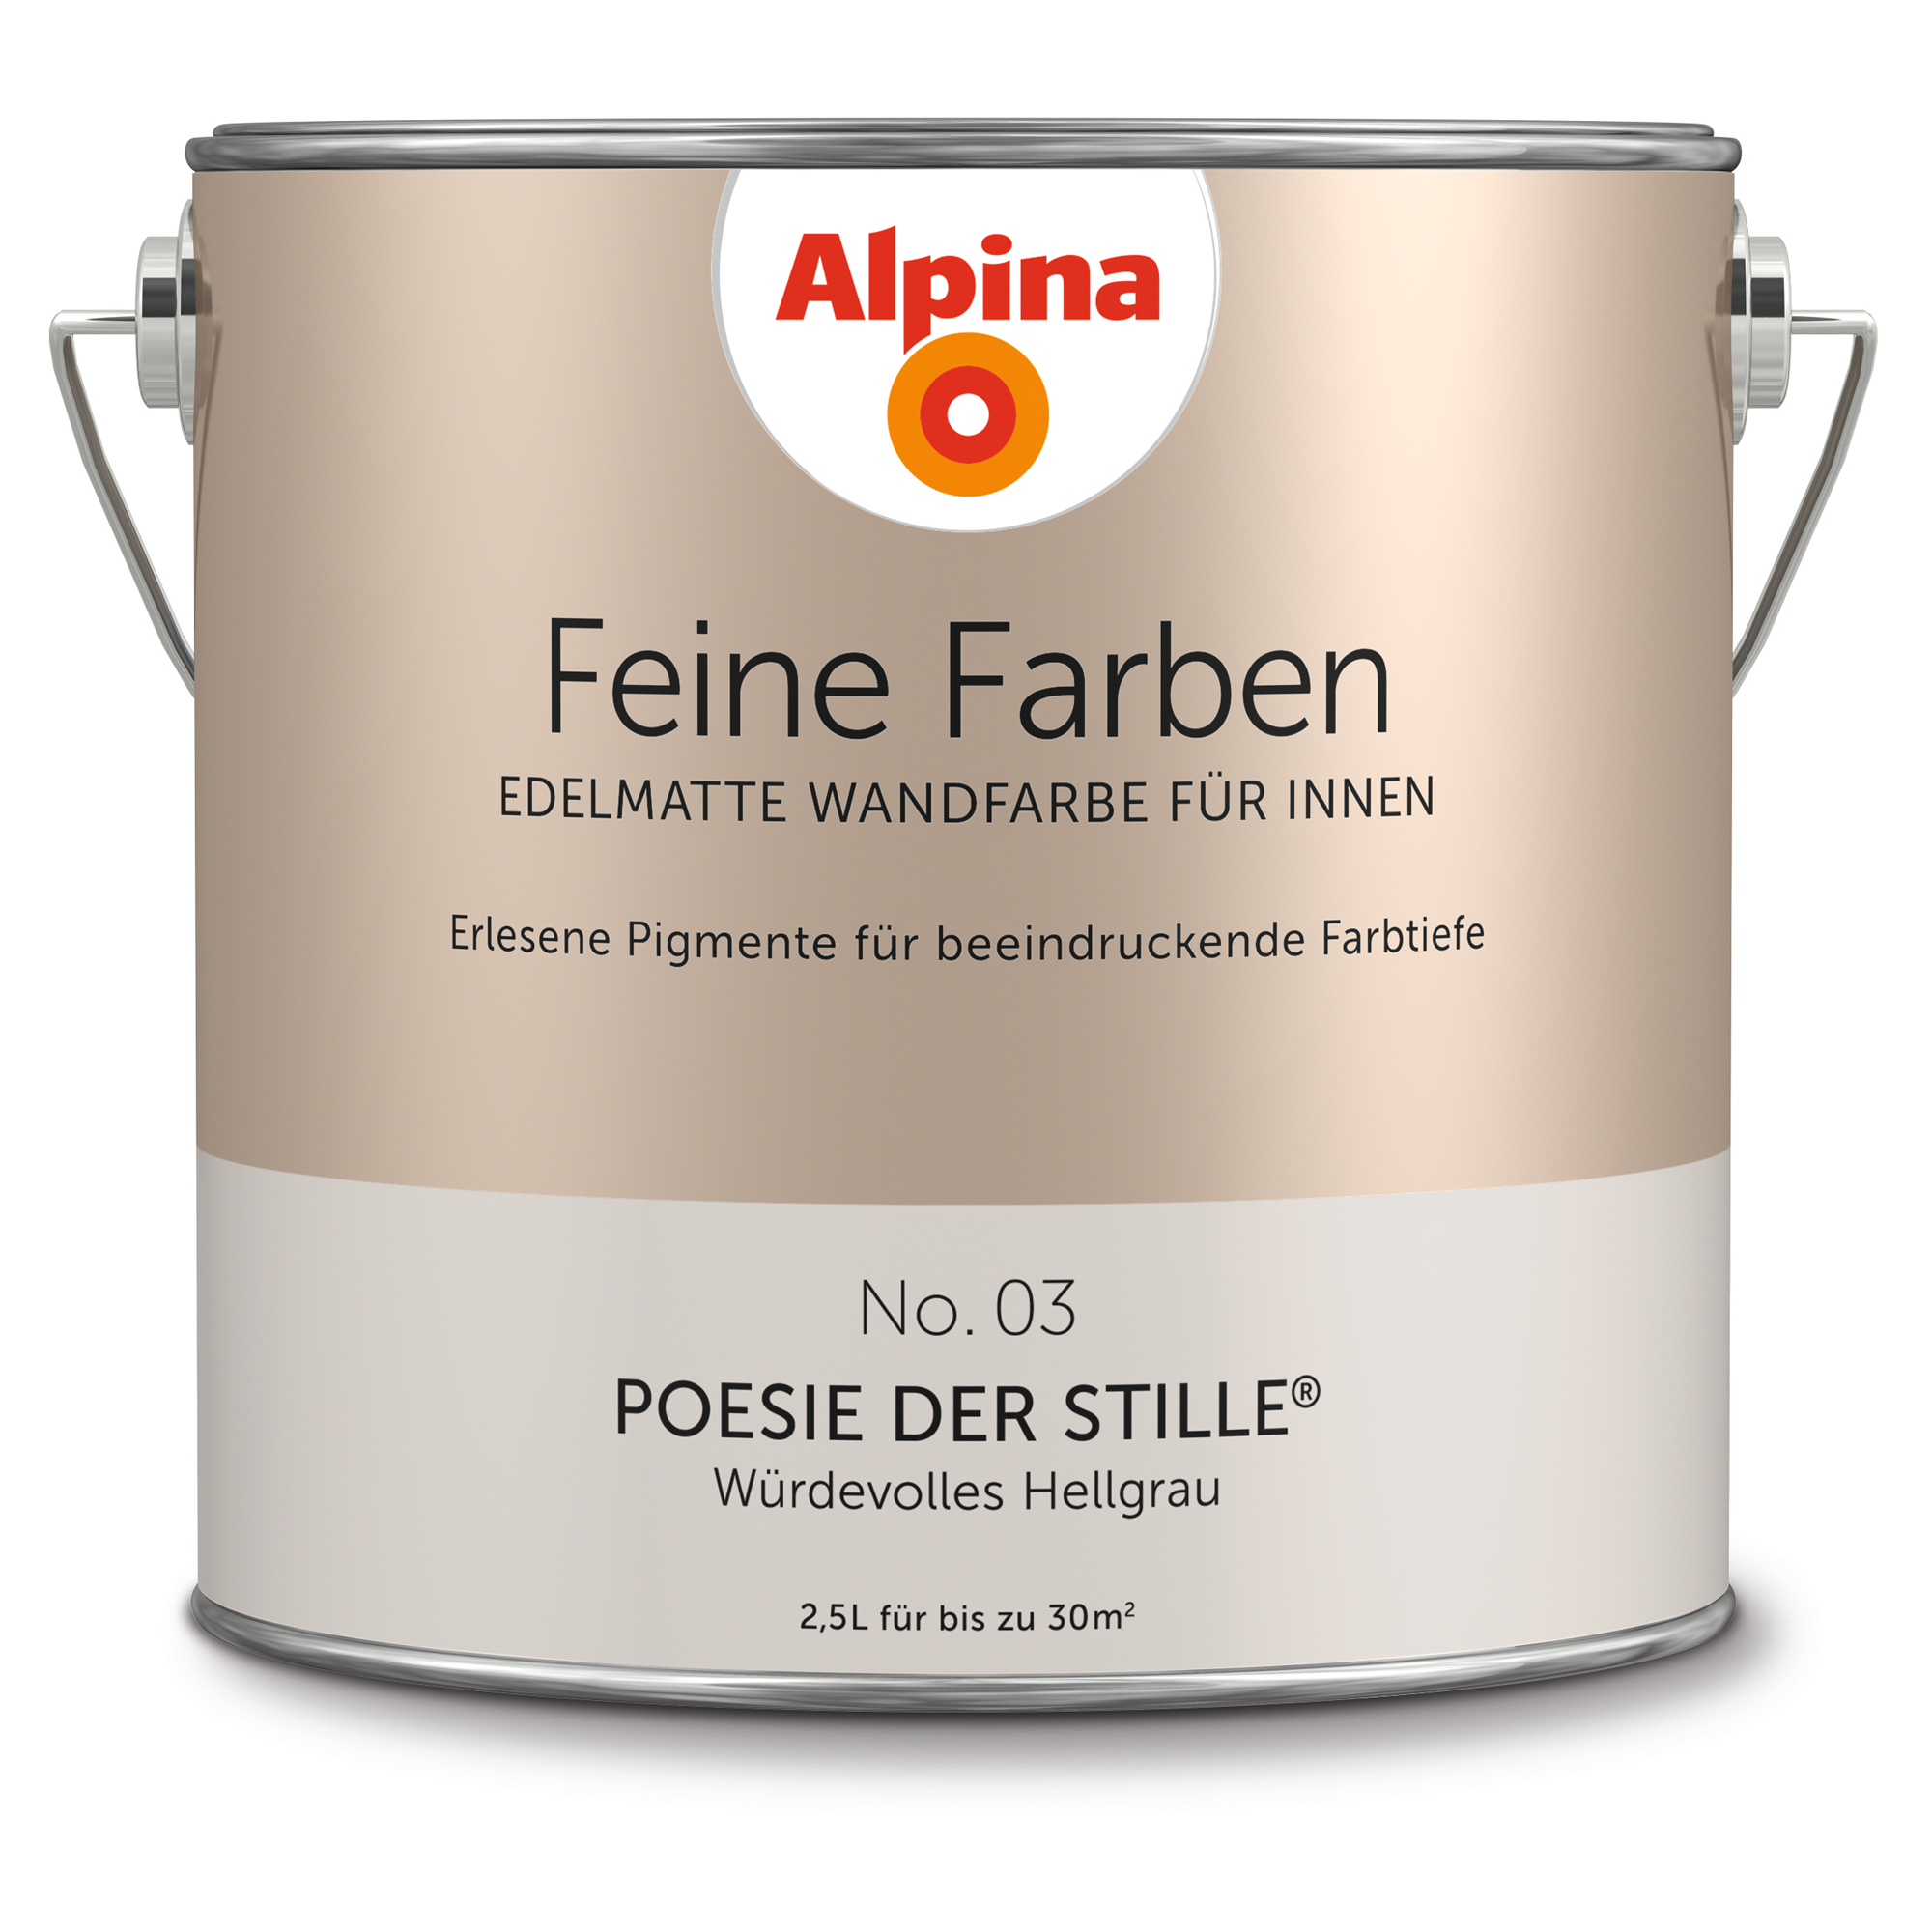 Alpina Wandfarbe U0027Feine Farbenu0027 No. 03 U0027Poesie Der Stilleu0027, Hellgrau, 2,5 L  ǀ Toom Baumarkt